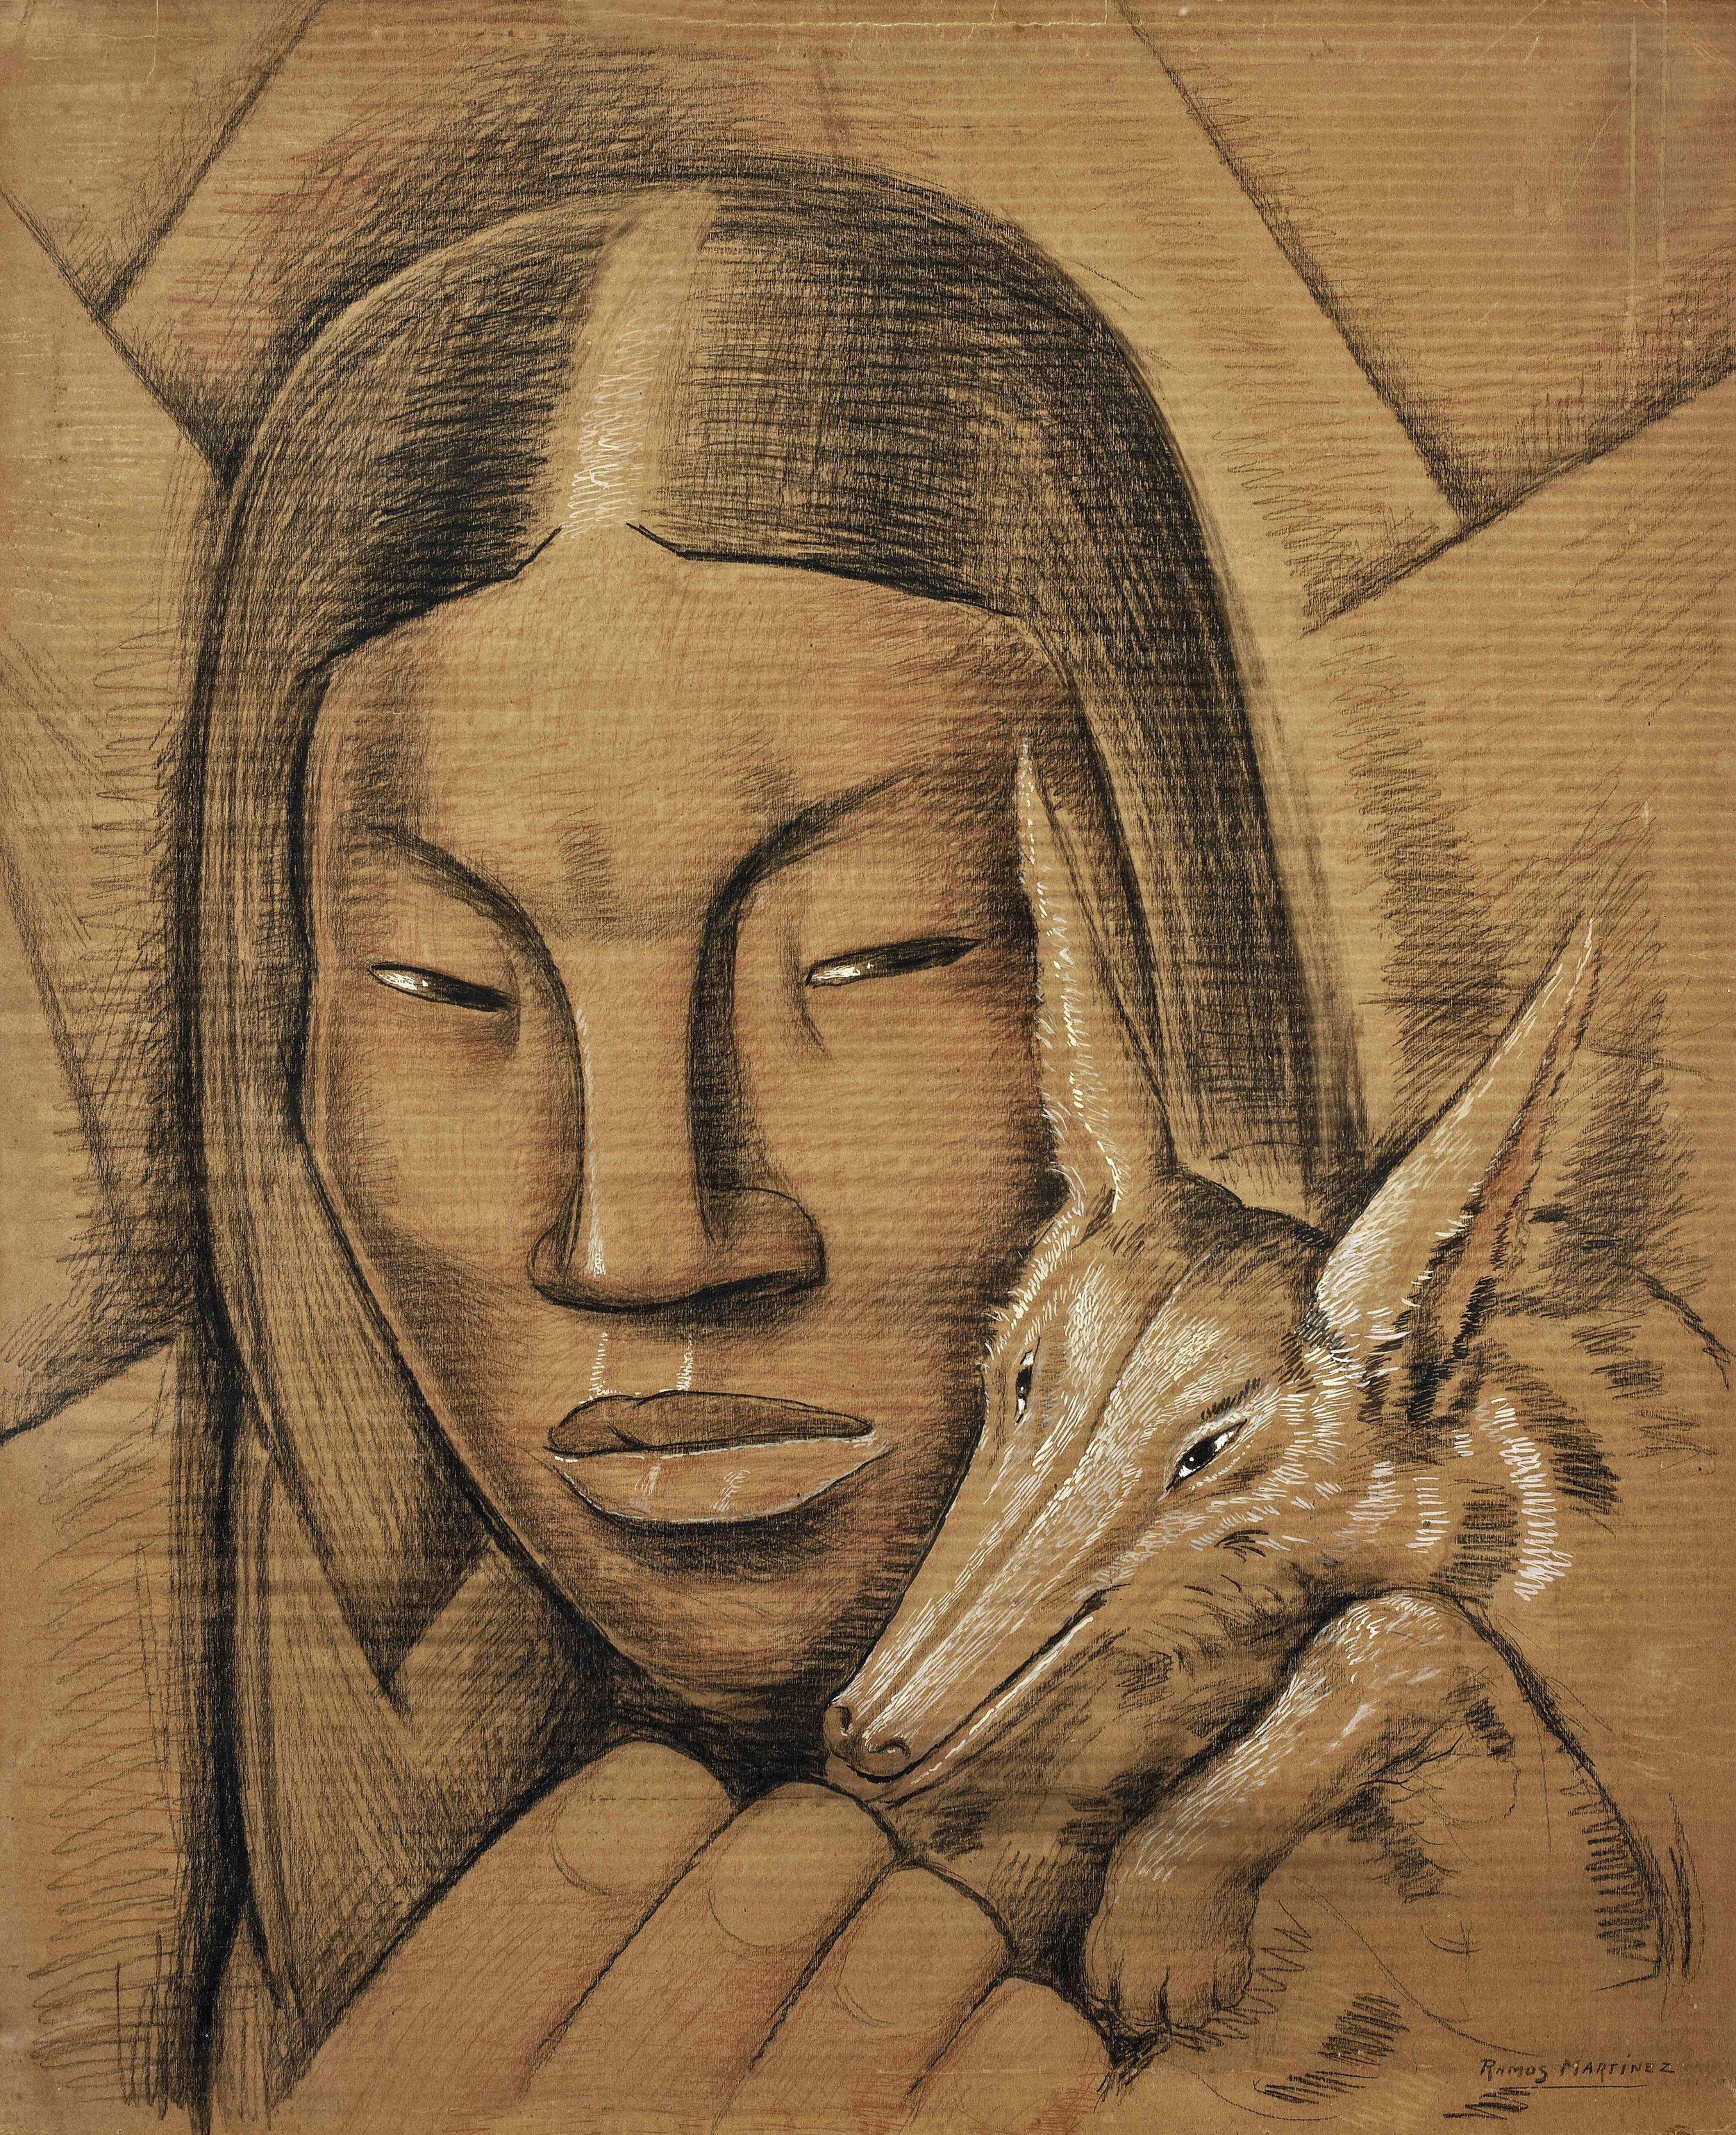 La India Cacomixtle / Indian Woman with Cacomixtle  ca. 1938 Conté crayon, tempera and charcoal on corrugated cardboard / crayon Conté, temple y carbón sobre papel cartón ondulado 42 x 34.5 inches / 106.7 x 87.6 centímetros Private collection